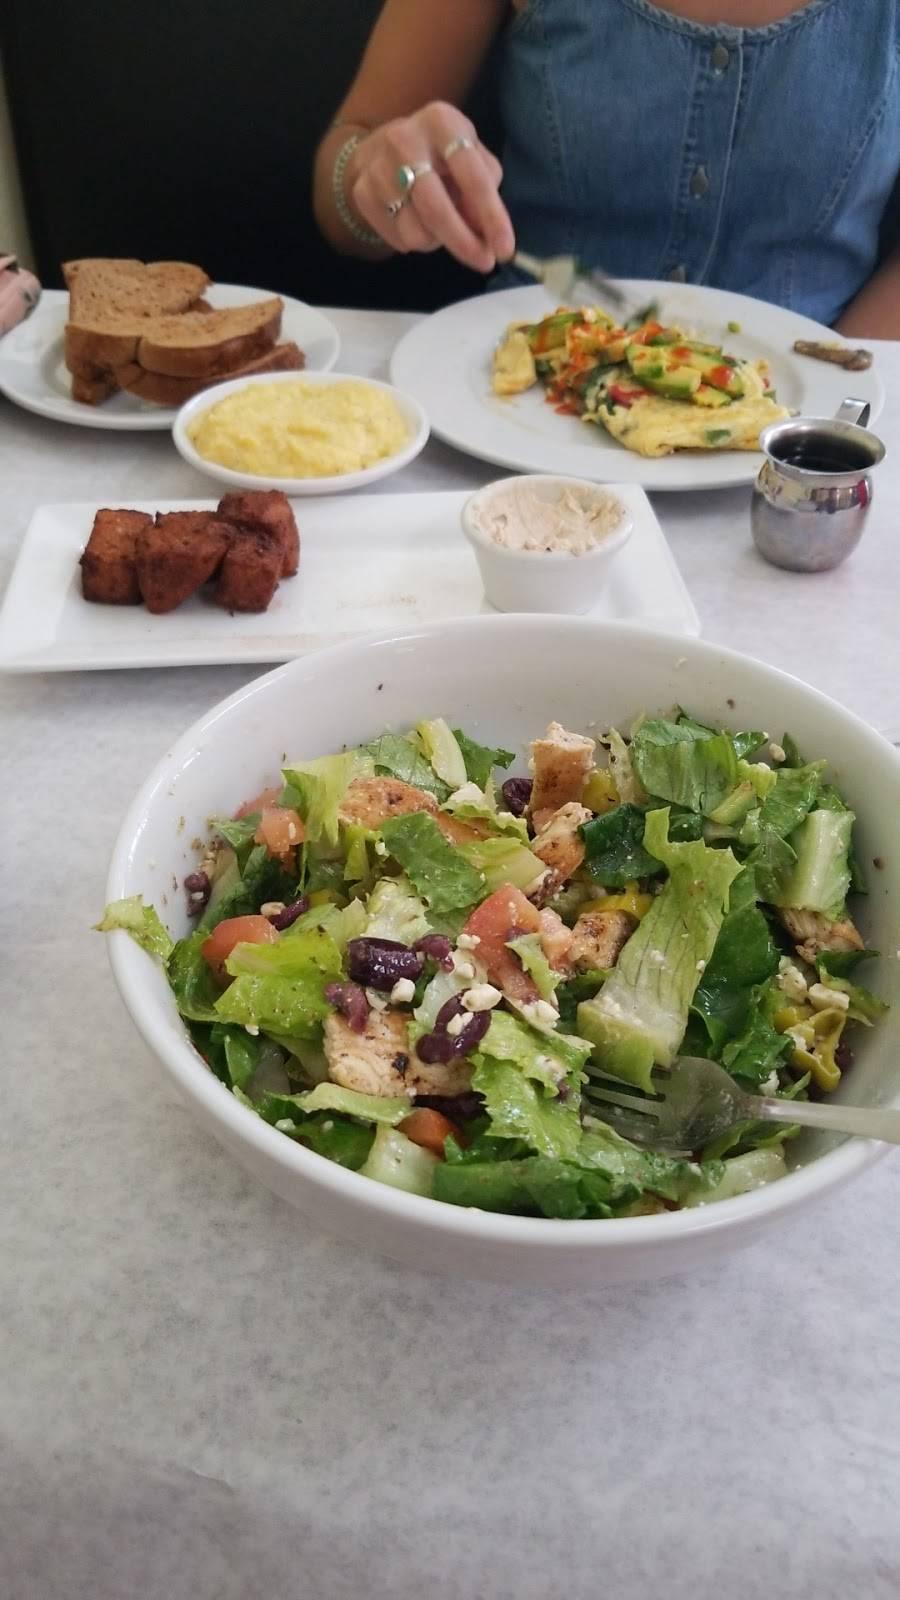 Johnny Grits   restaurant   857 E Klosterman Rd, Tarpon Springs, FL 34689, USA   7279424748 OR +1 727-942-4748